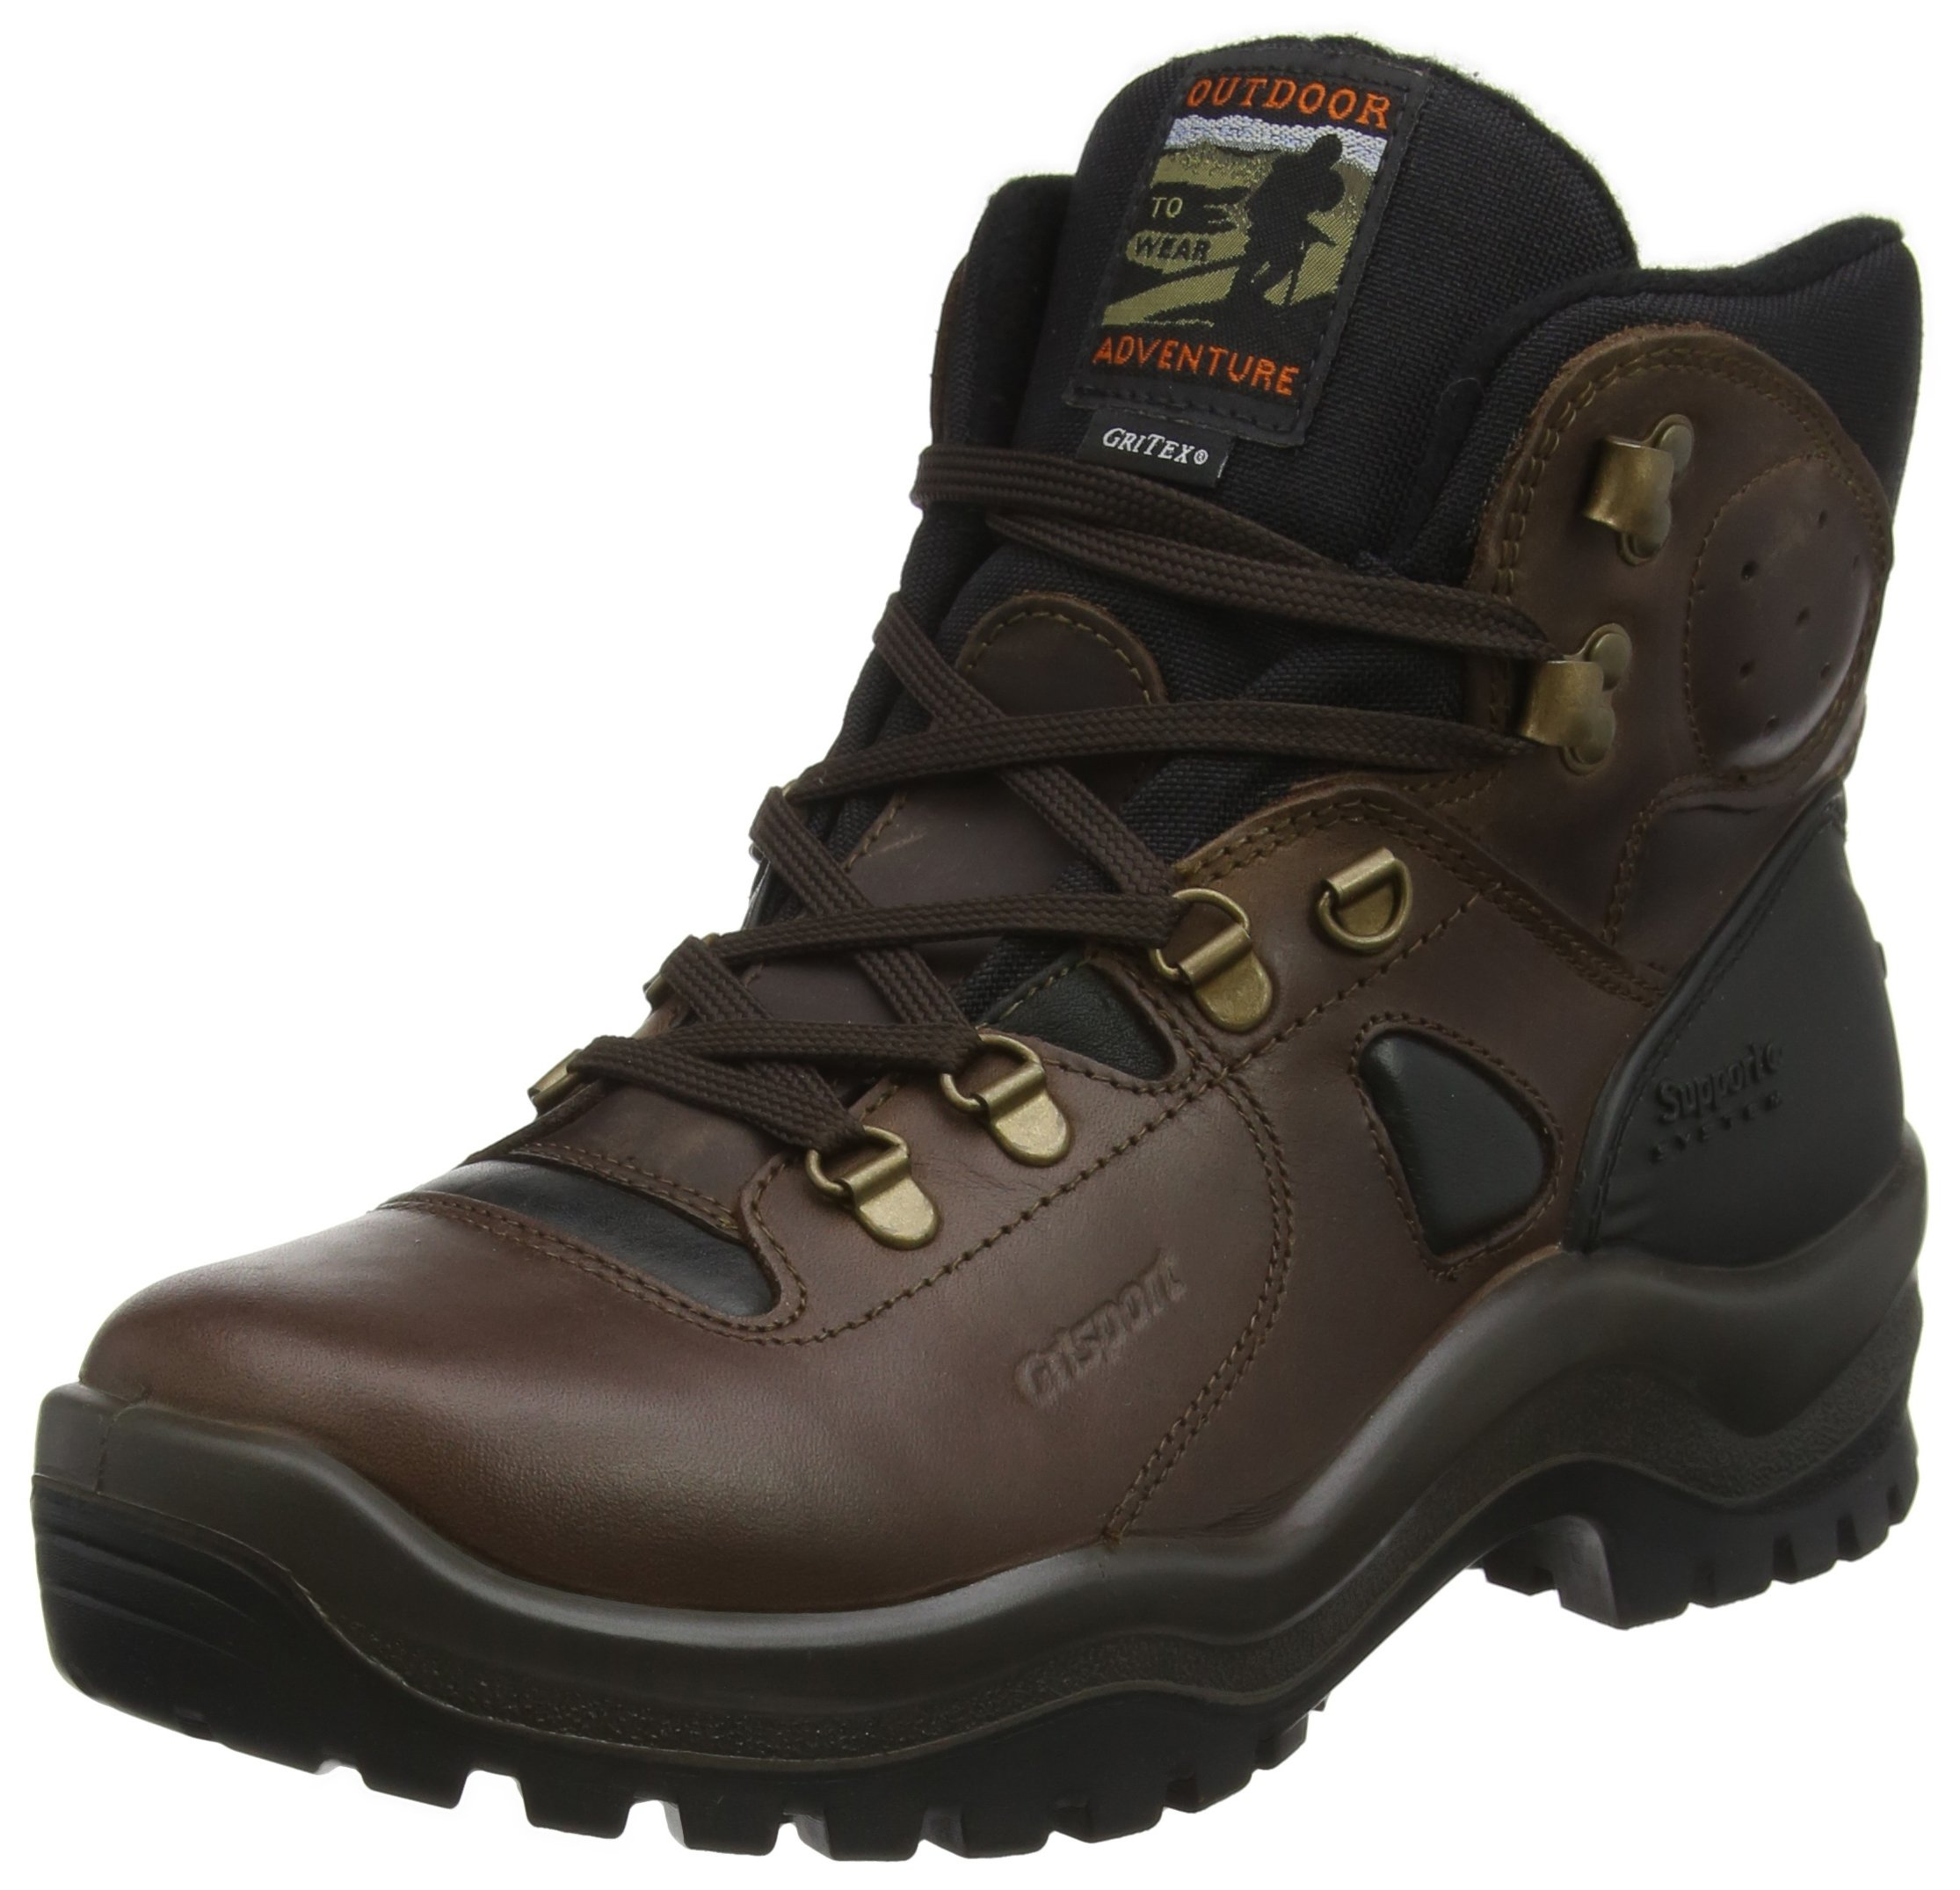 Grisport Unisex Adults 629 Dakar V.9 High Rise Hiking Boots